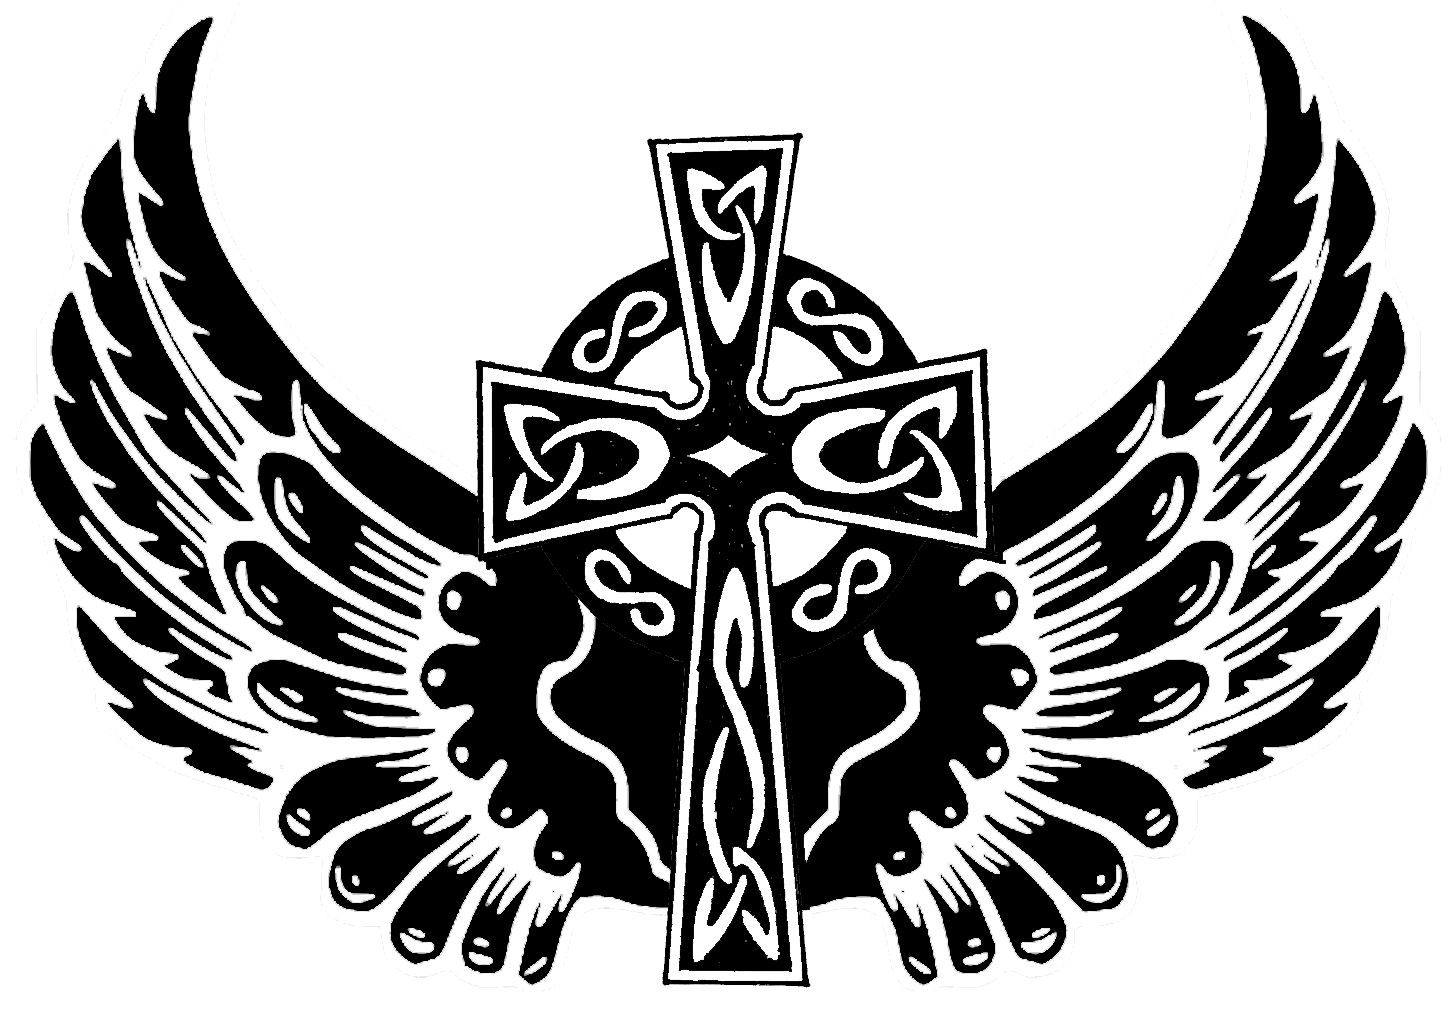 http://3.bp.blogspot.com/-nt6qC7JZuj8/T-ZzrgfT8AI/AAAAAAAAA0Q/c2D7i8xBWoo/s1600/eagles+with+celtic+cross+ready+for+etching.jpg